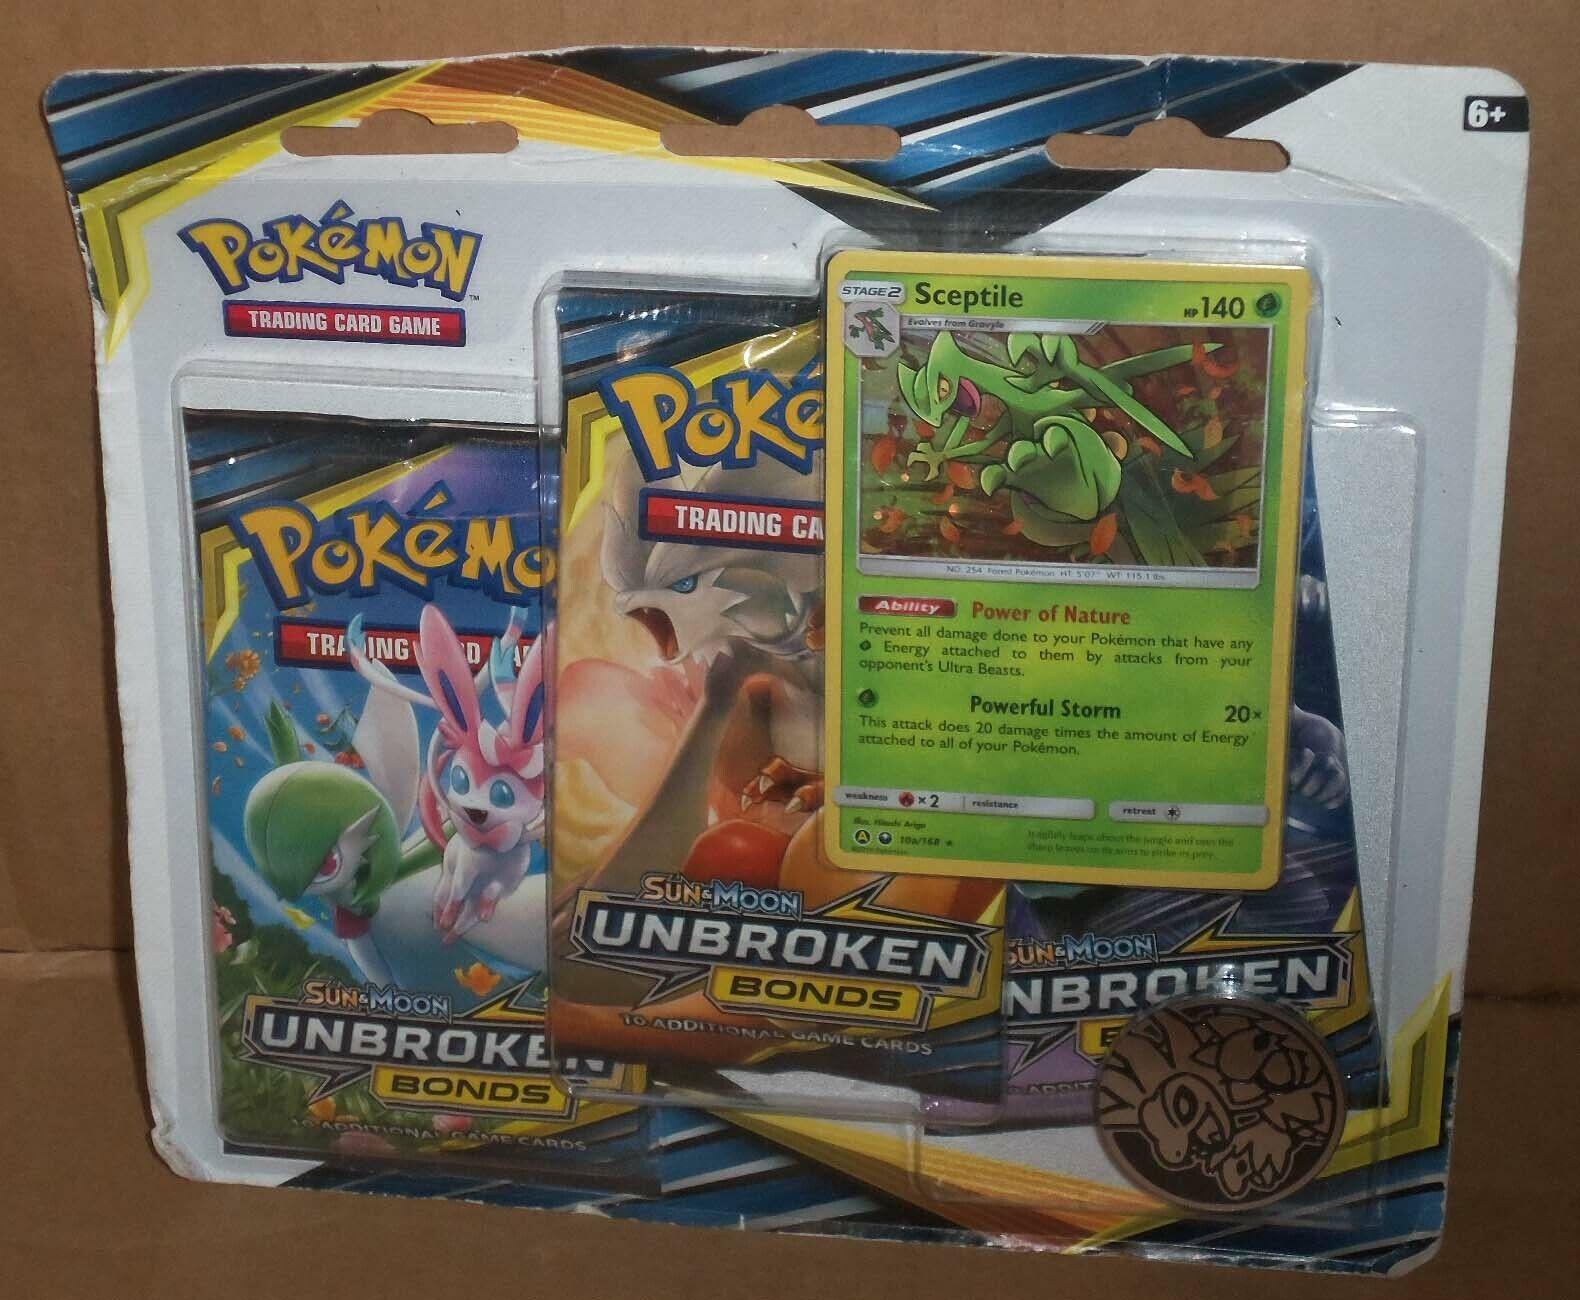 2 3 Pack Blisters Pokemon Sun and Moon Unbroken Bonds